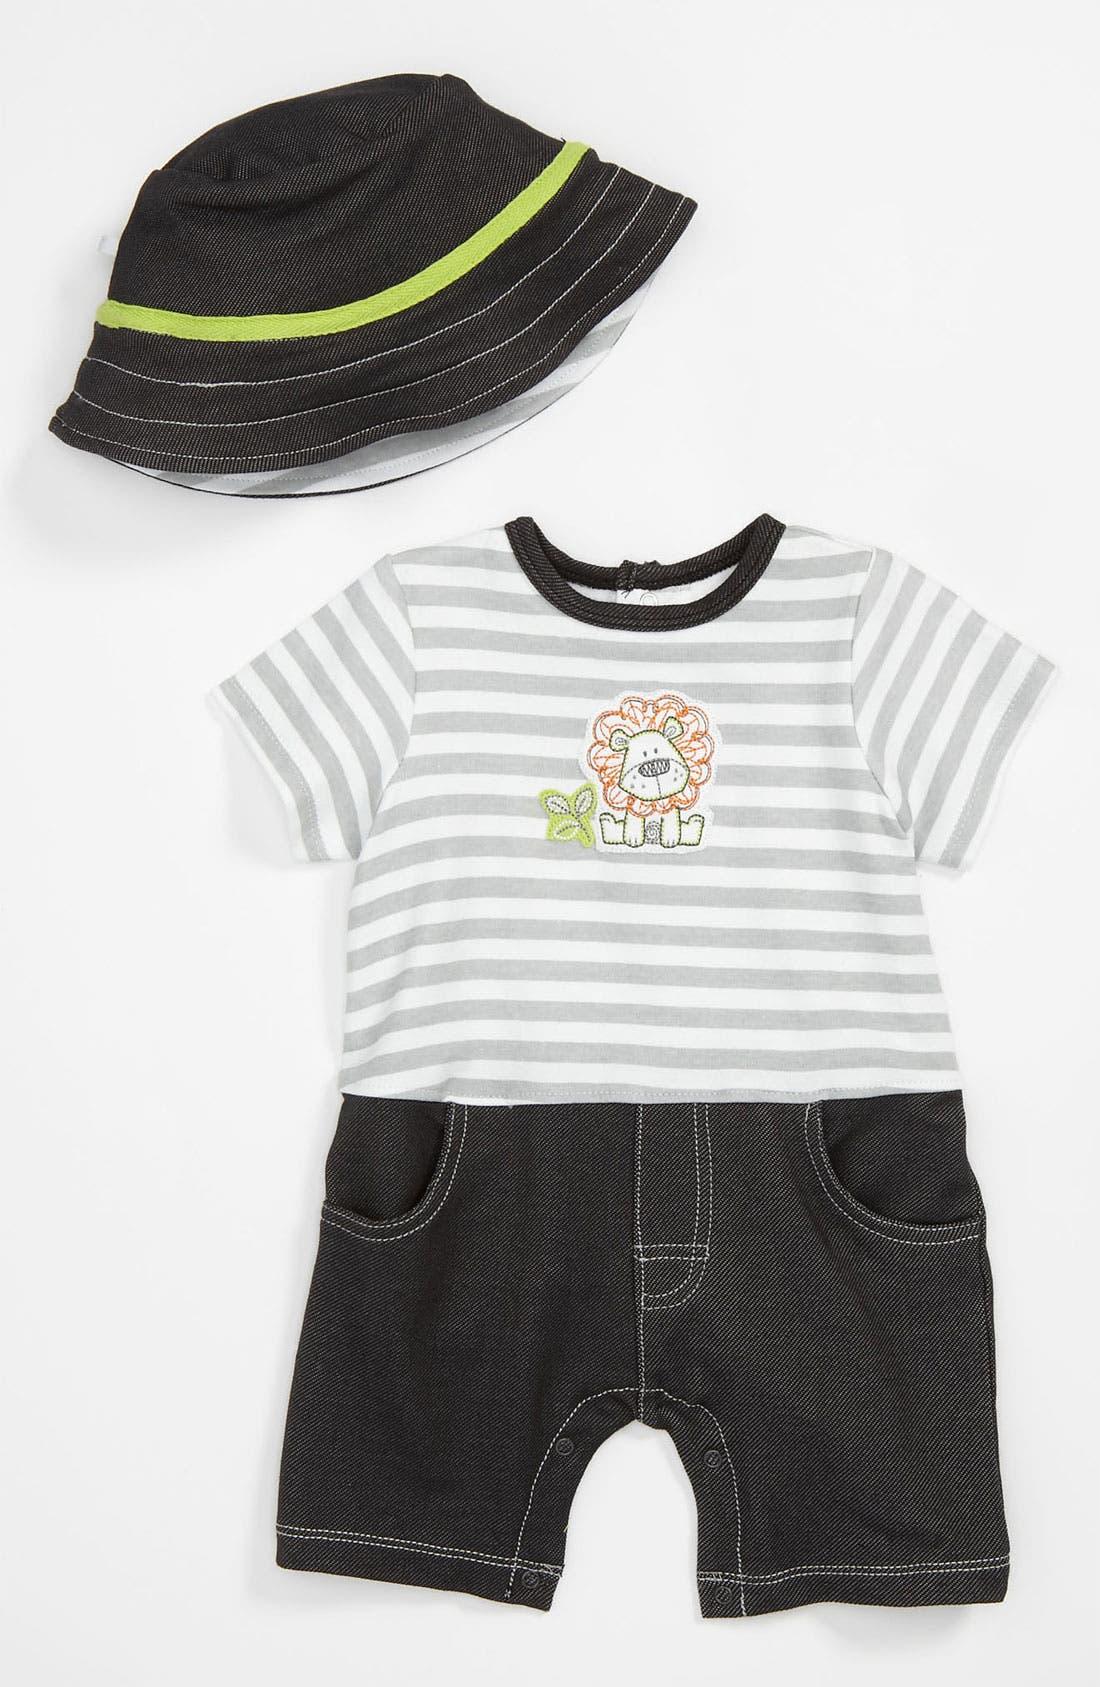 Main Image - Little Me 'Safari Club' Romper & Hat (Infant)